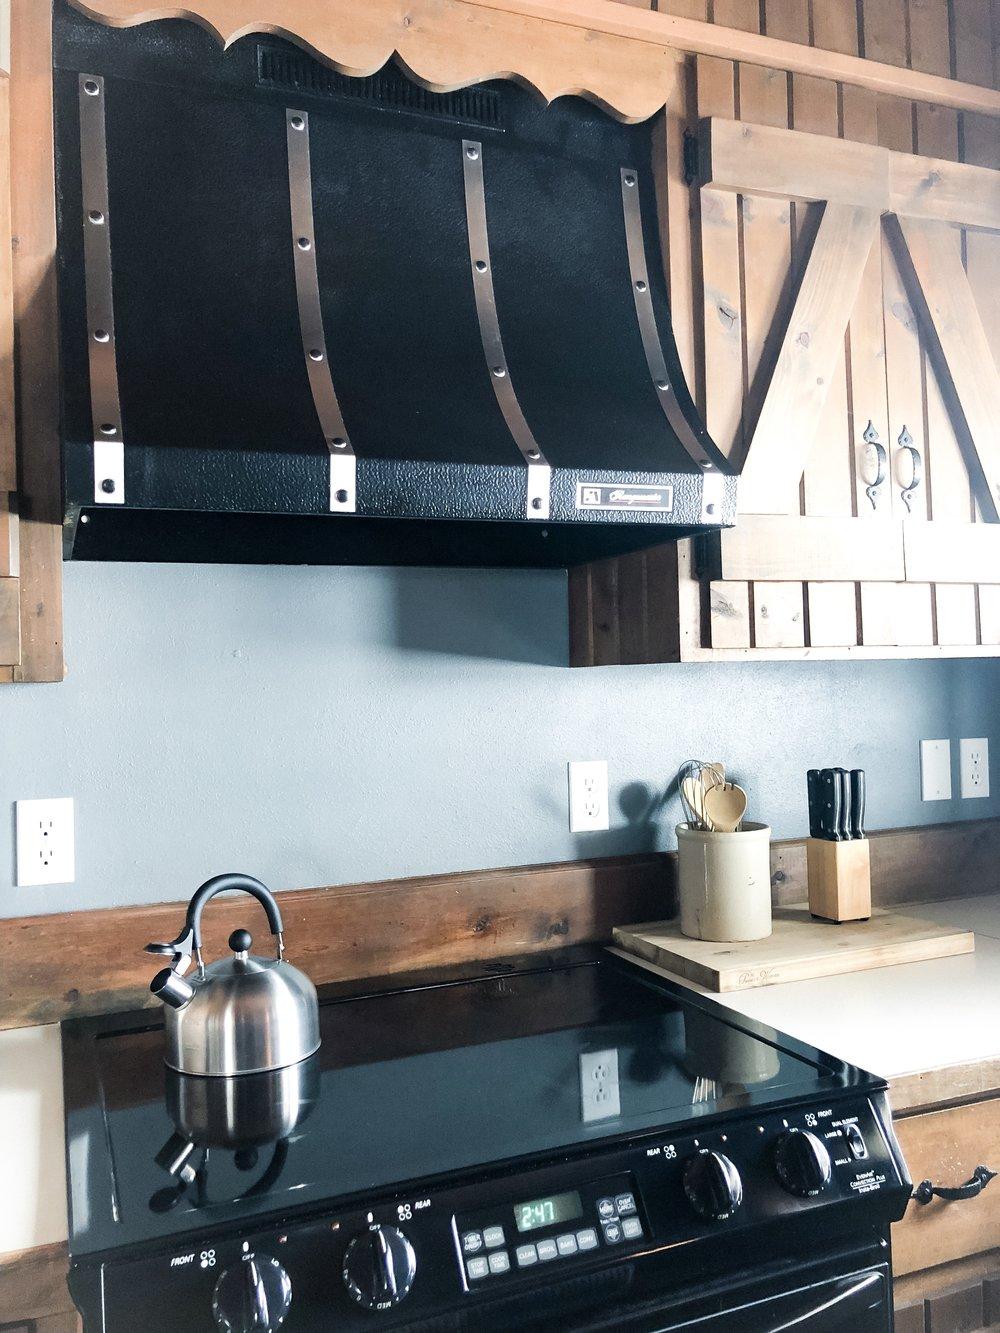 Knotty Pine Guest House-Cabin Getaway in Northeastern Iowa